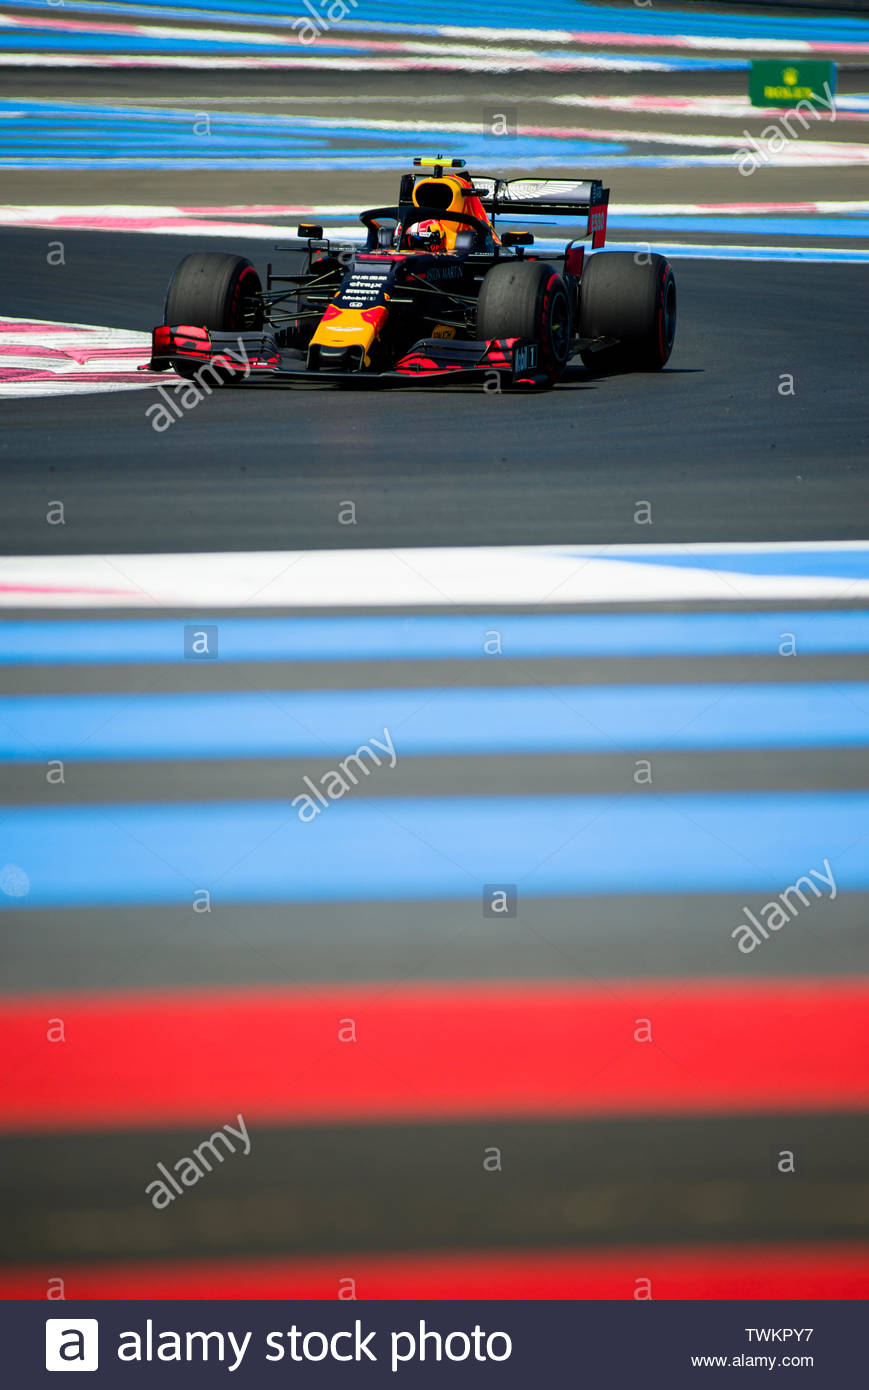 21st june 2019 circuit automobile paul ricard le castellet marseille france fia formula 1 grand prix of france practise sessions pierre gasly TWKPY7